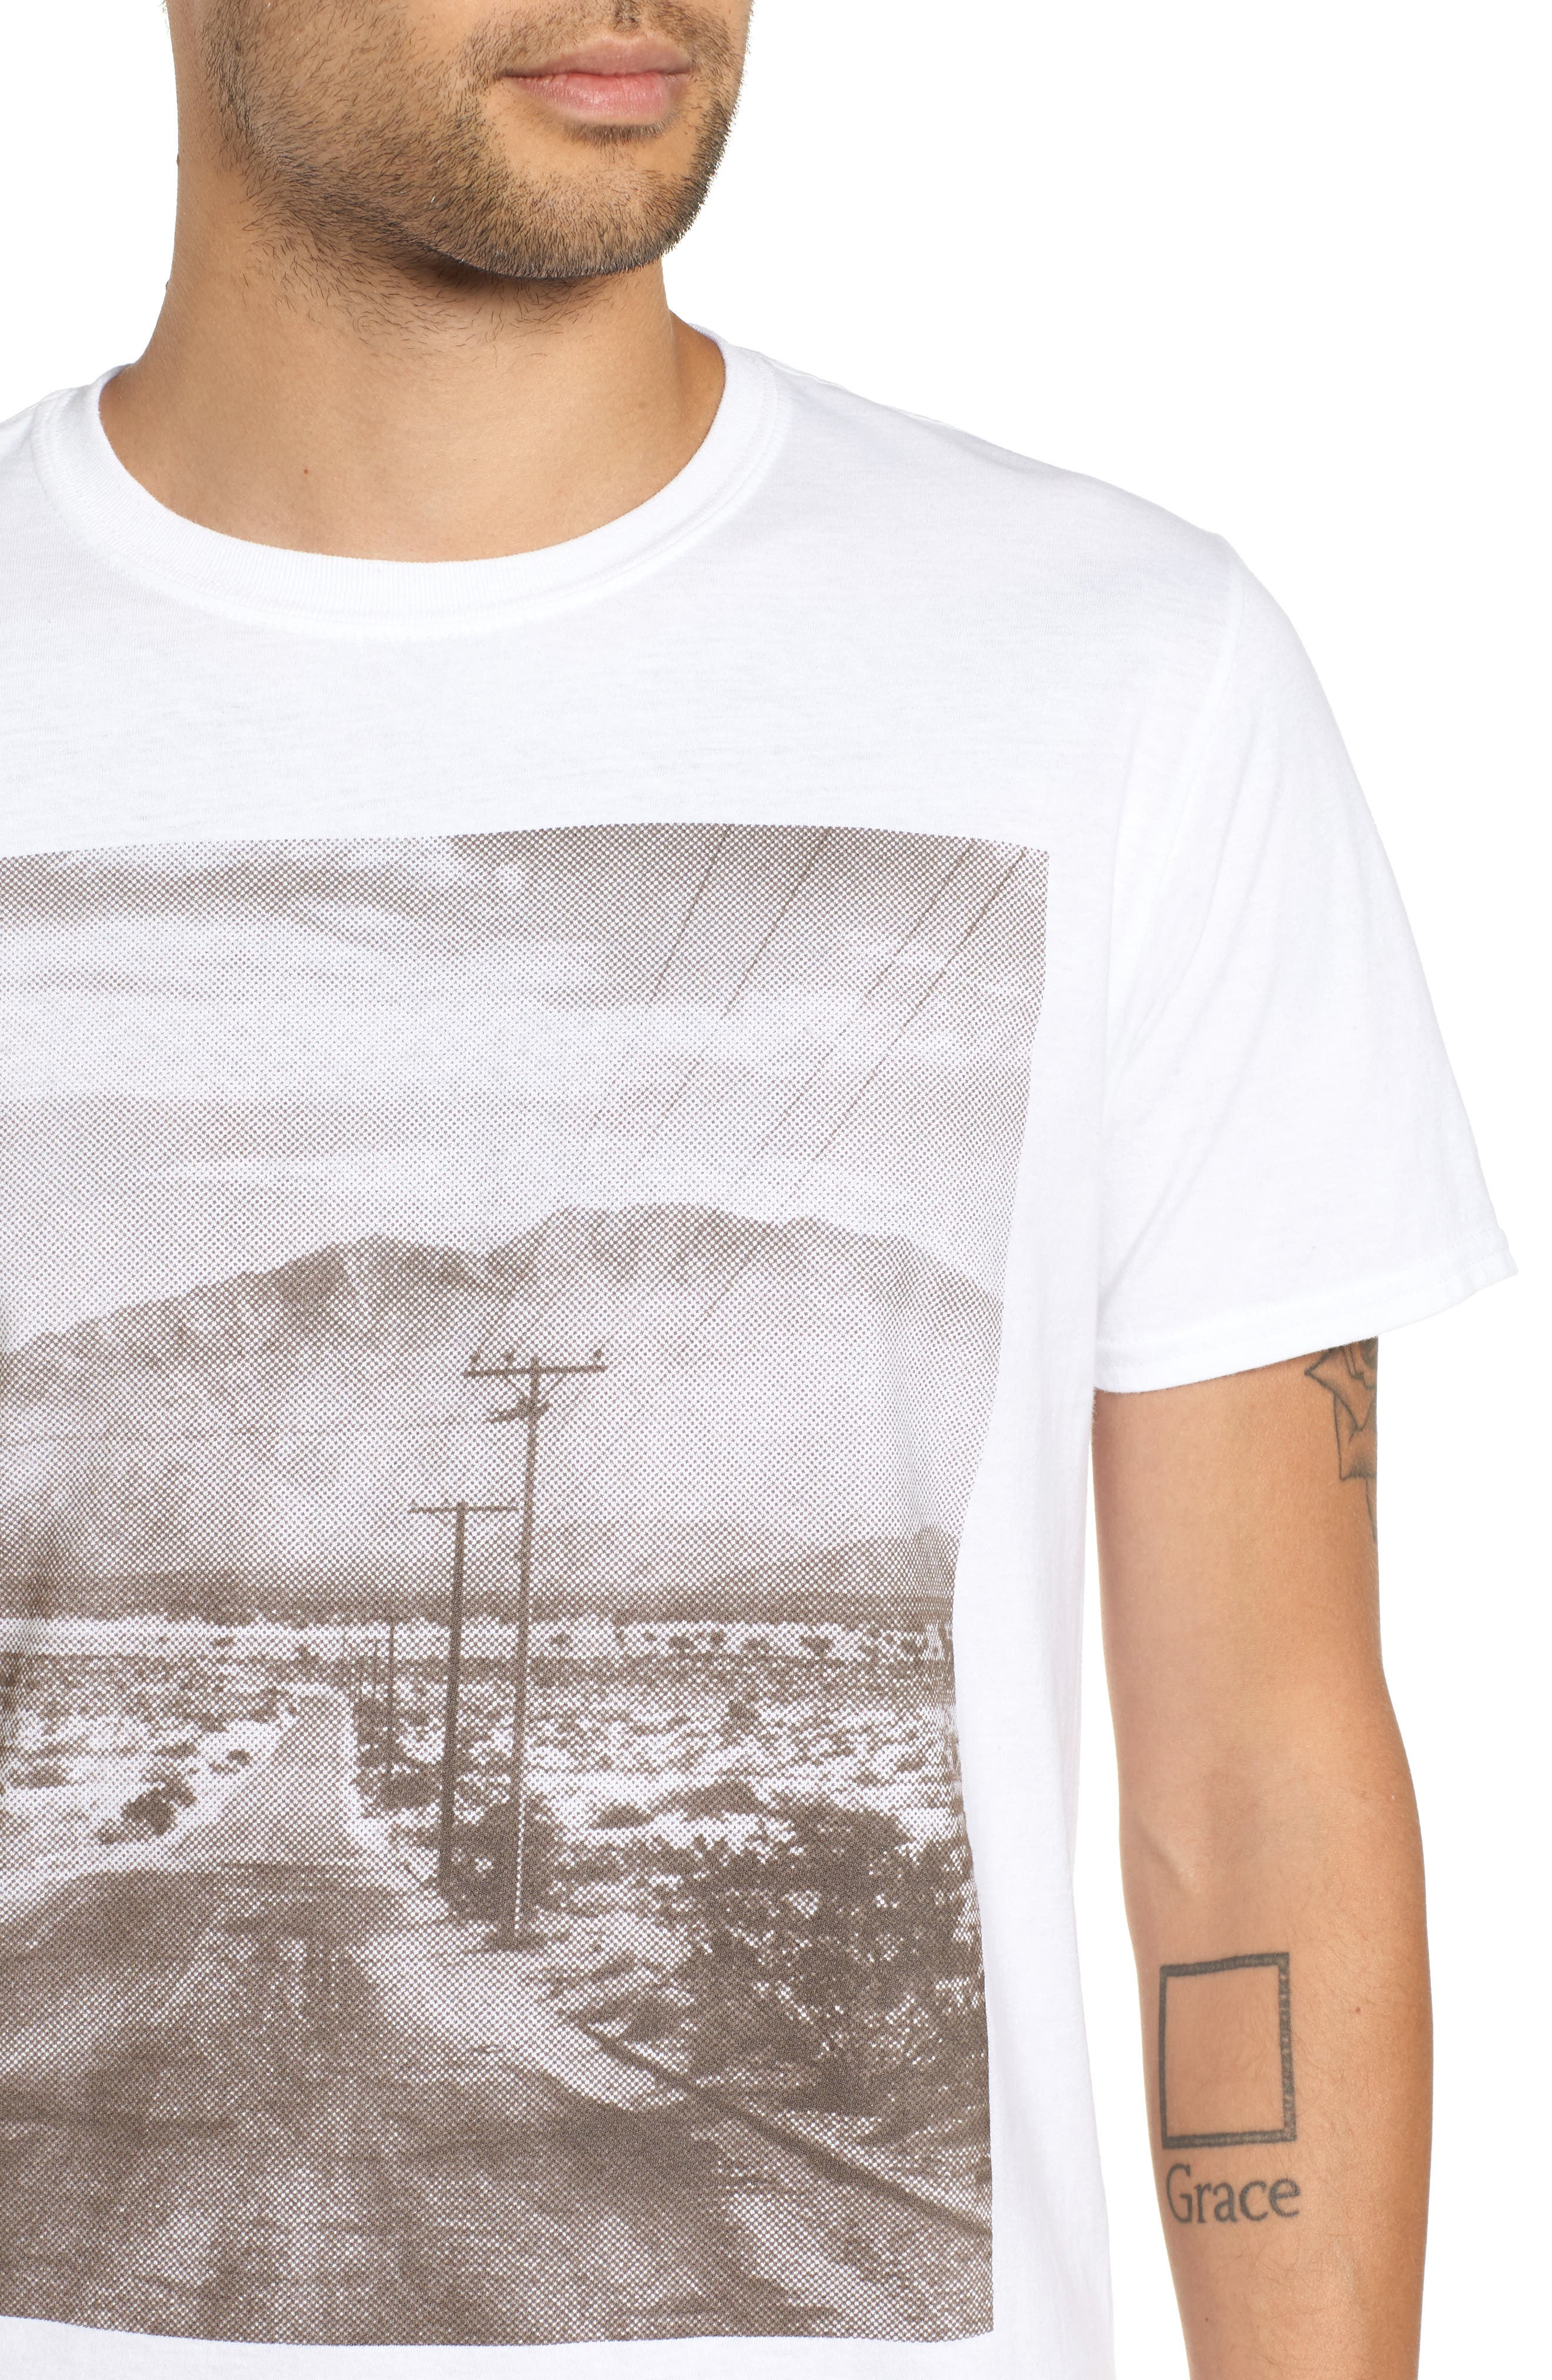 Deserted Road Photo T-Shirt,                             Alternate thumbnail 4, color,                             100